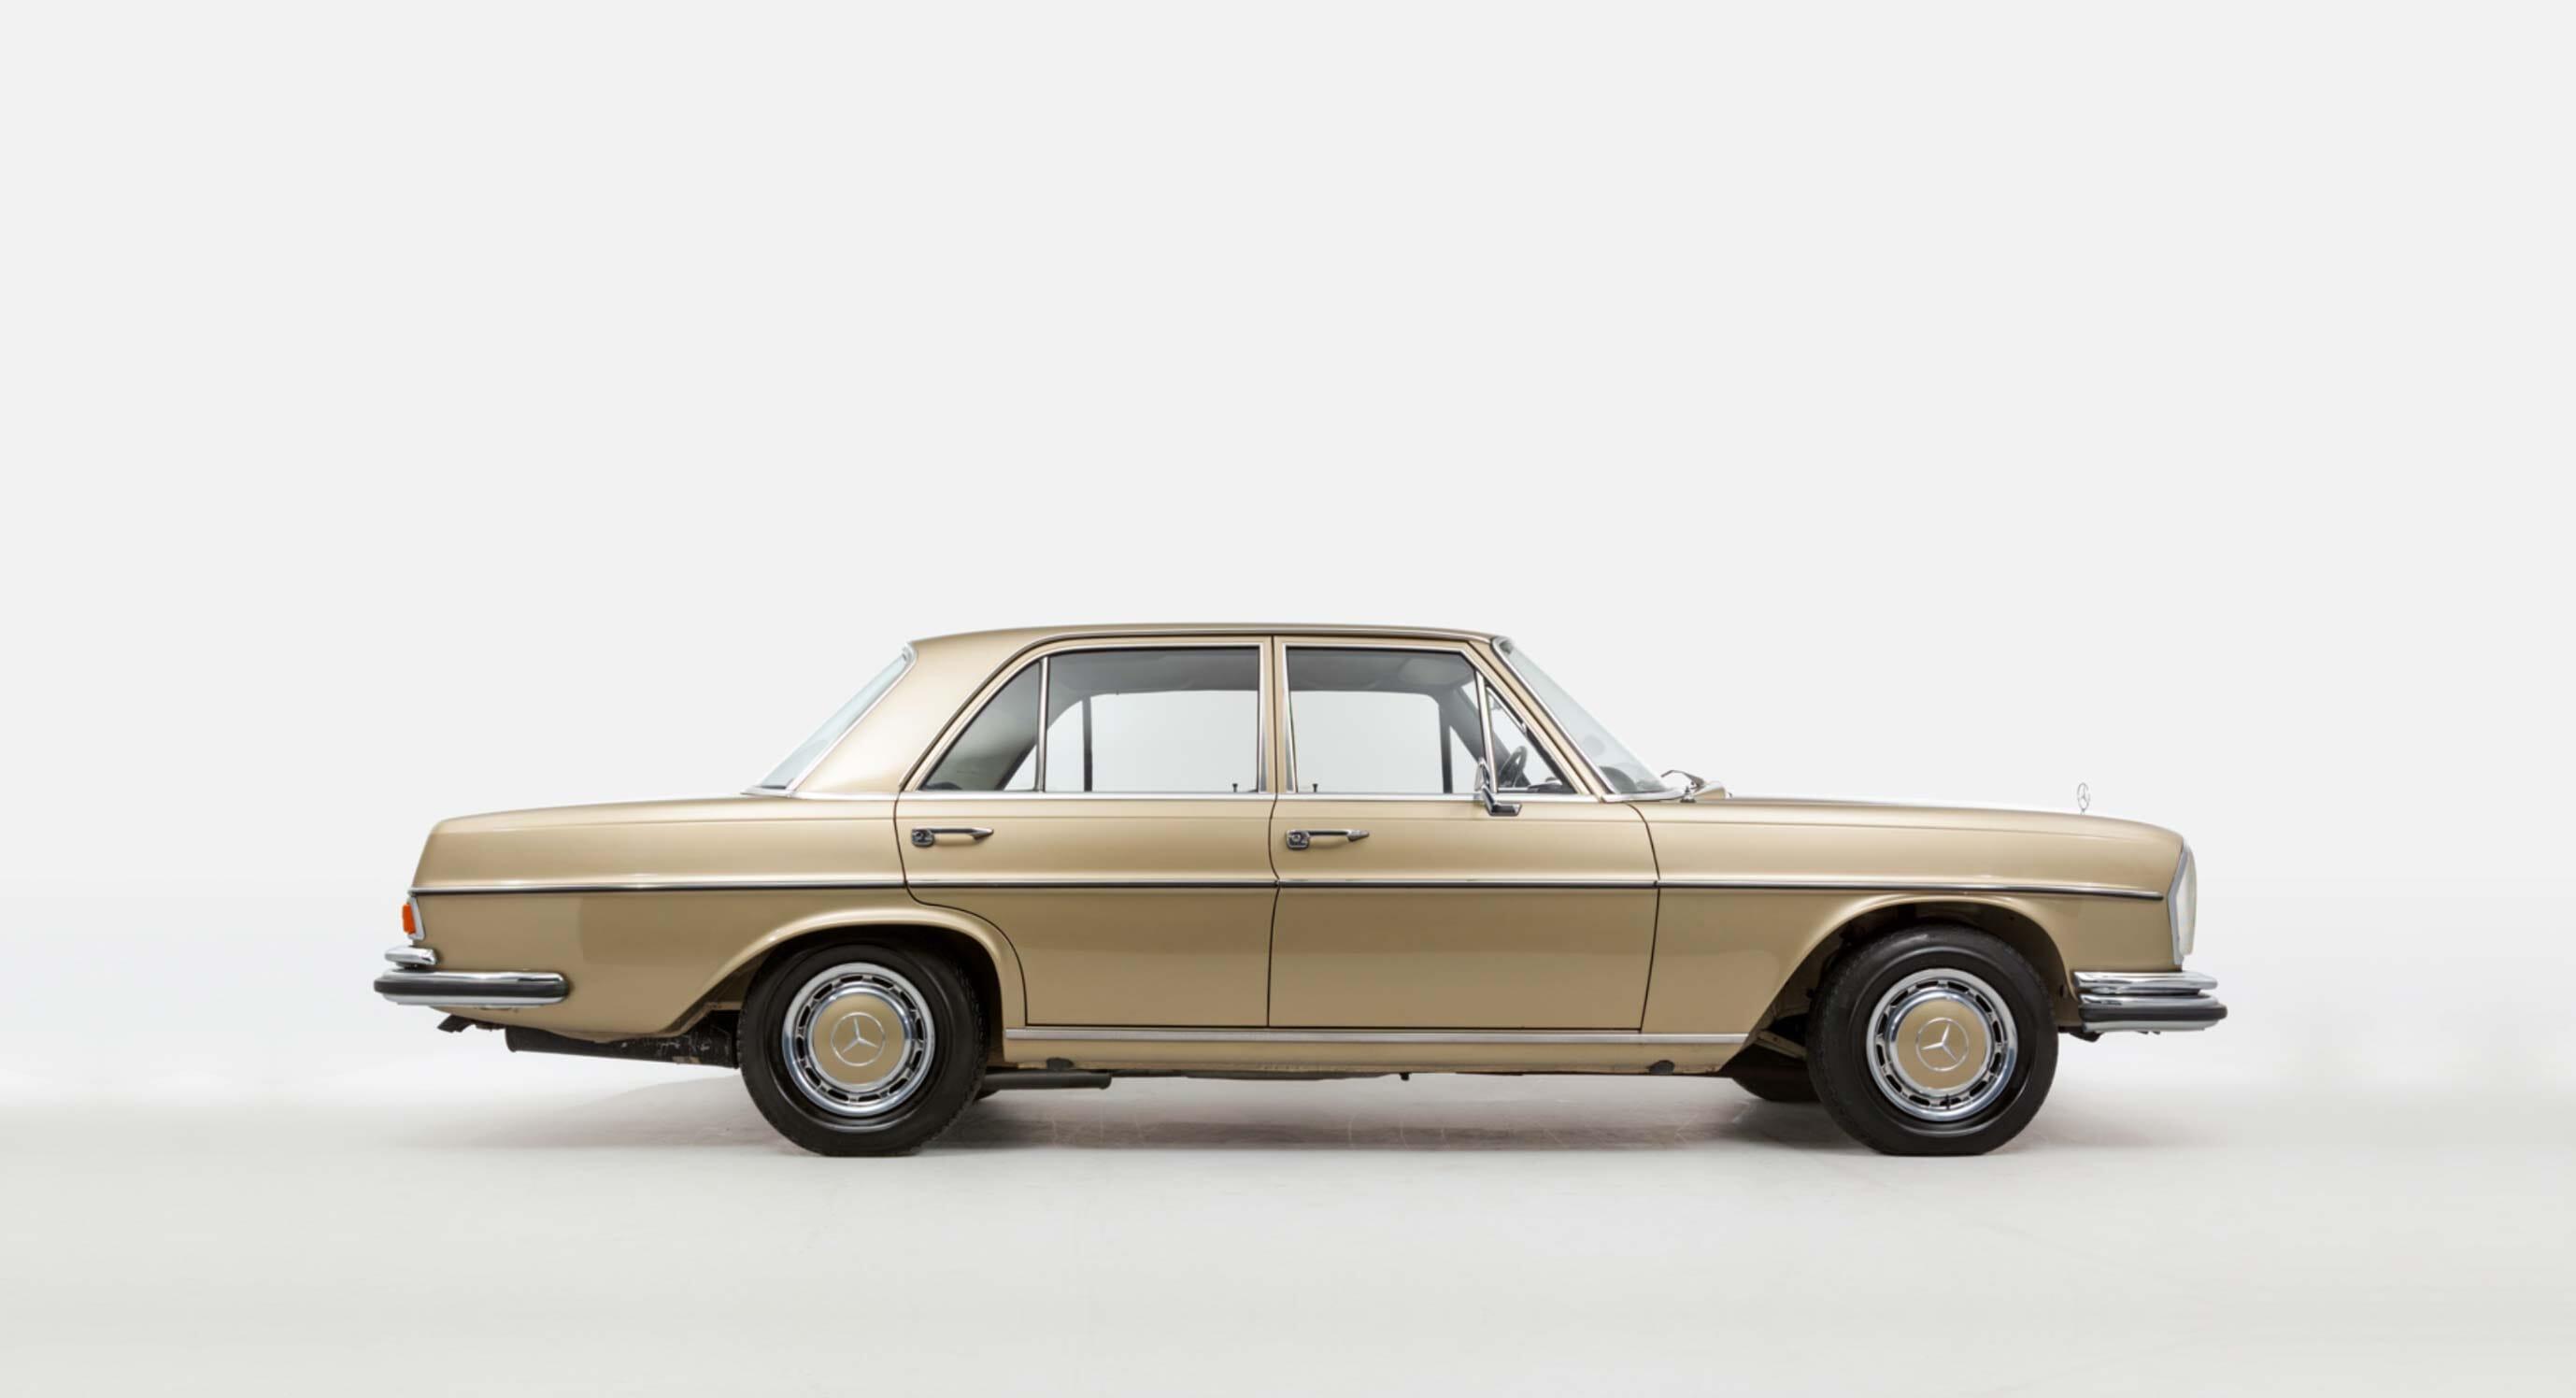 Gold Standard: The Surprisingly Affordable Mercedes 280 SE